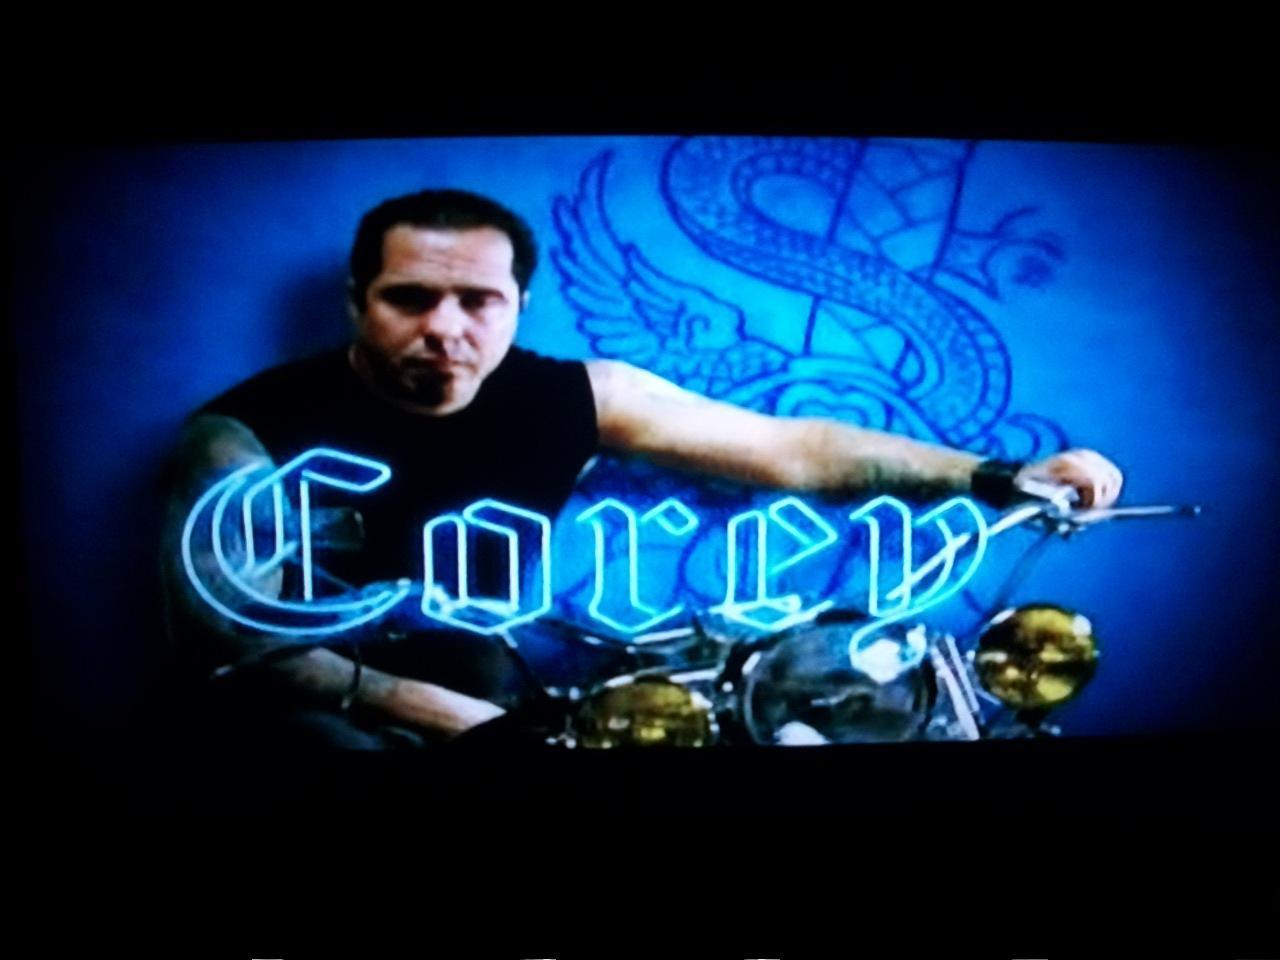 http://3.bp.blogspot.com/_wanGigYxLSY/TMonv8NTQpI/AAAAAAAACE0/7QyI89sZF54/s1600/Corey%20Miller.JPG